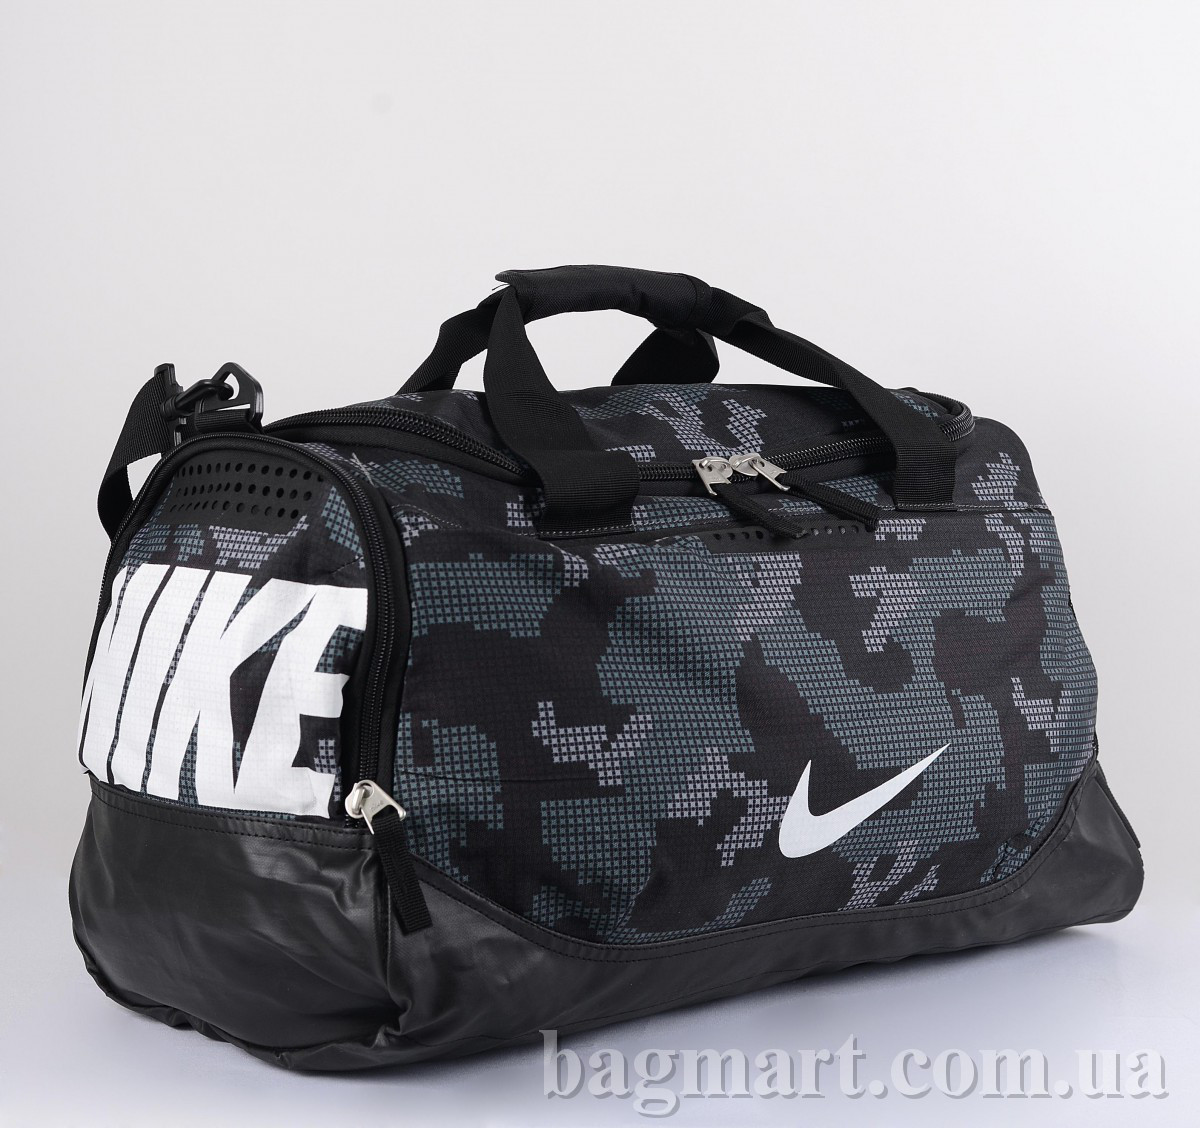 859f284d0653 Спортивная сумка NIKE маленькая №3027-4: продажа, цена в Черновцах ...